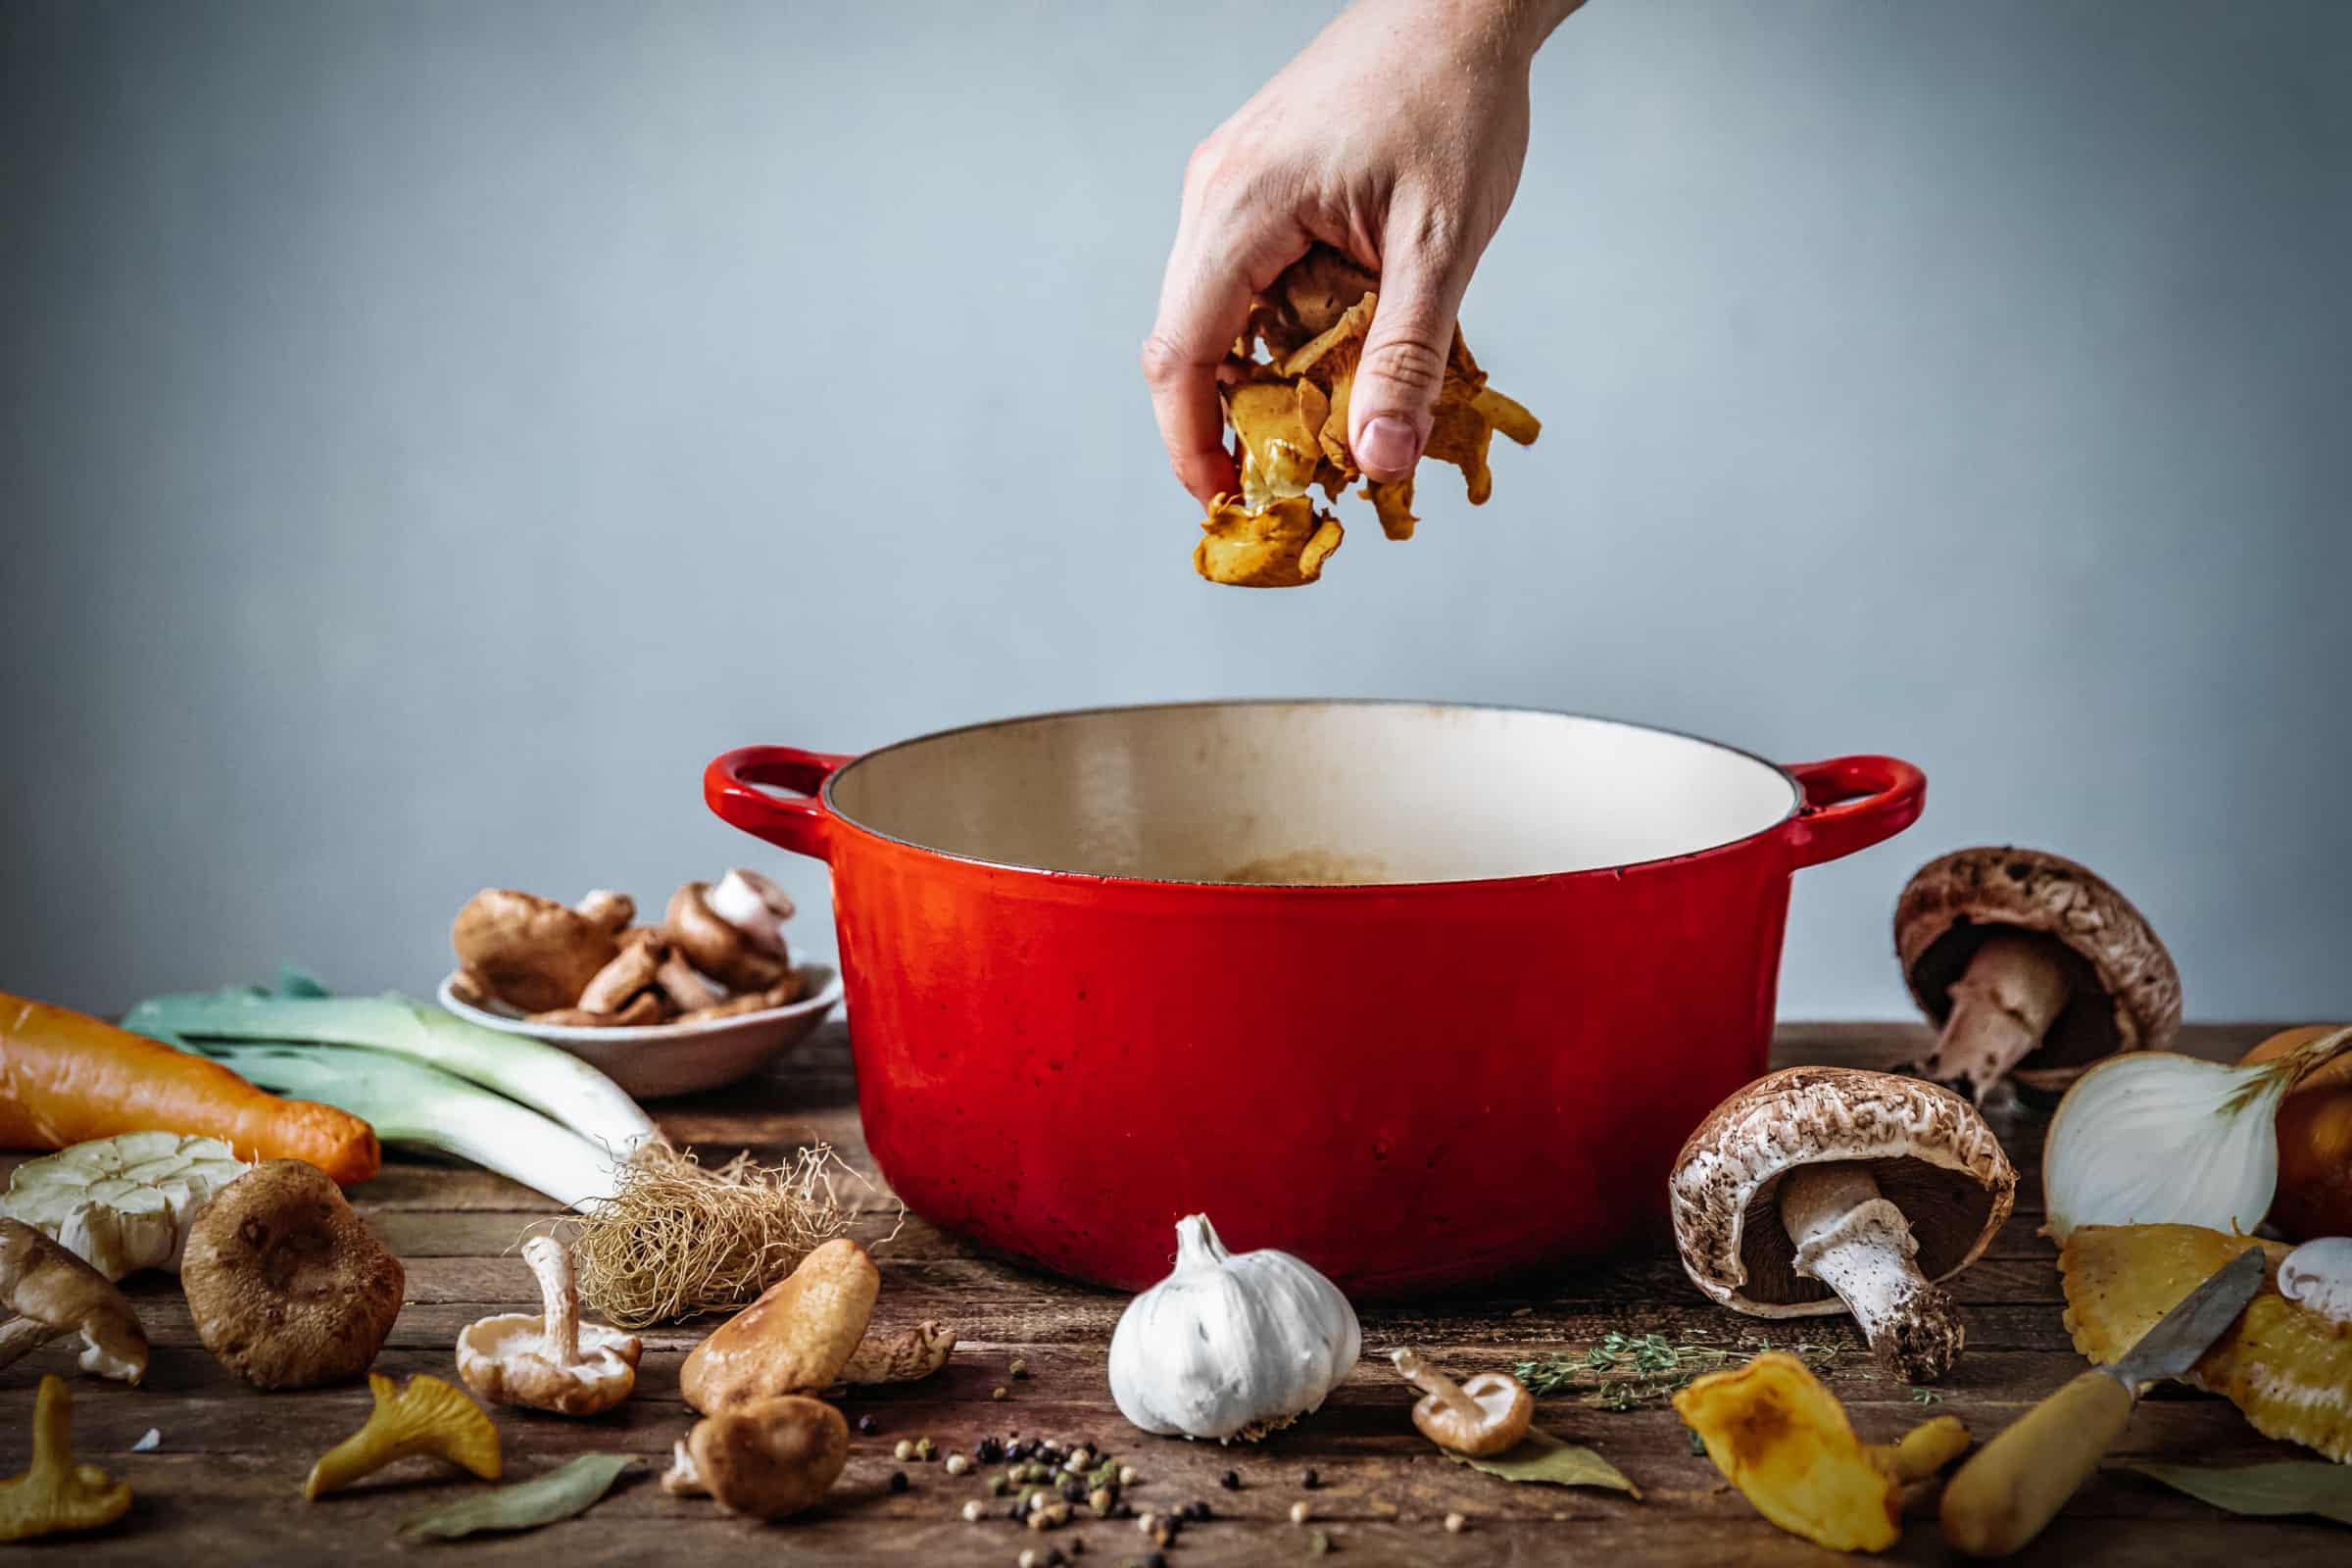 Adding mushrooms to the stock pot